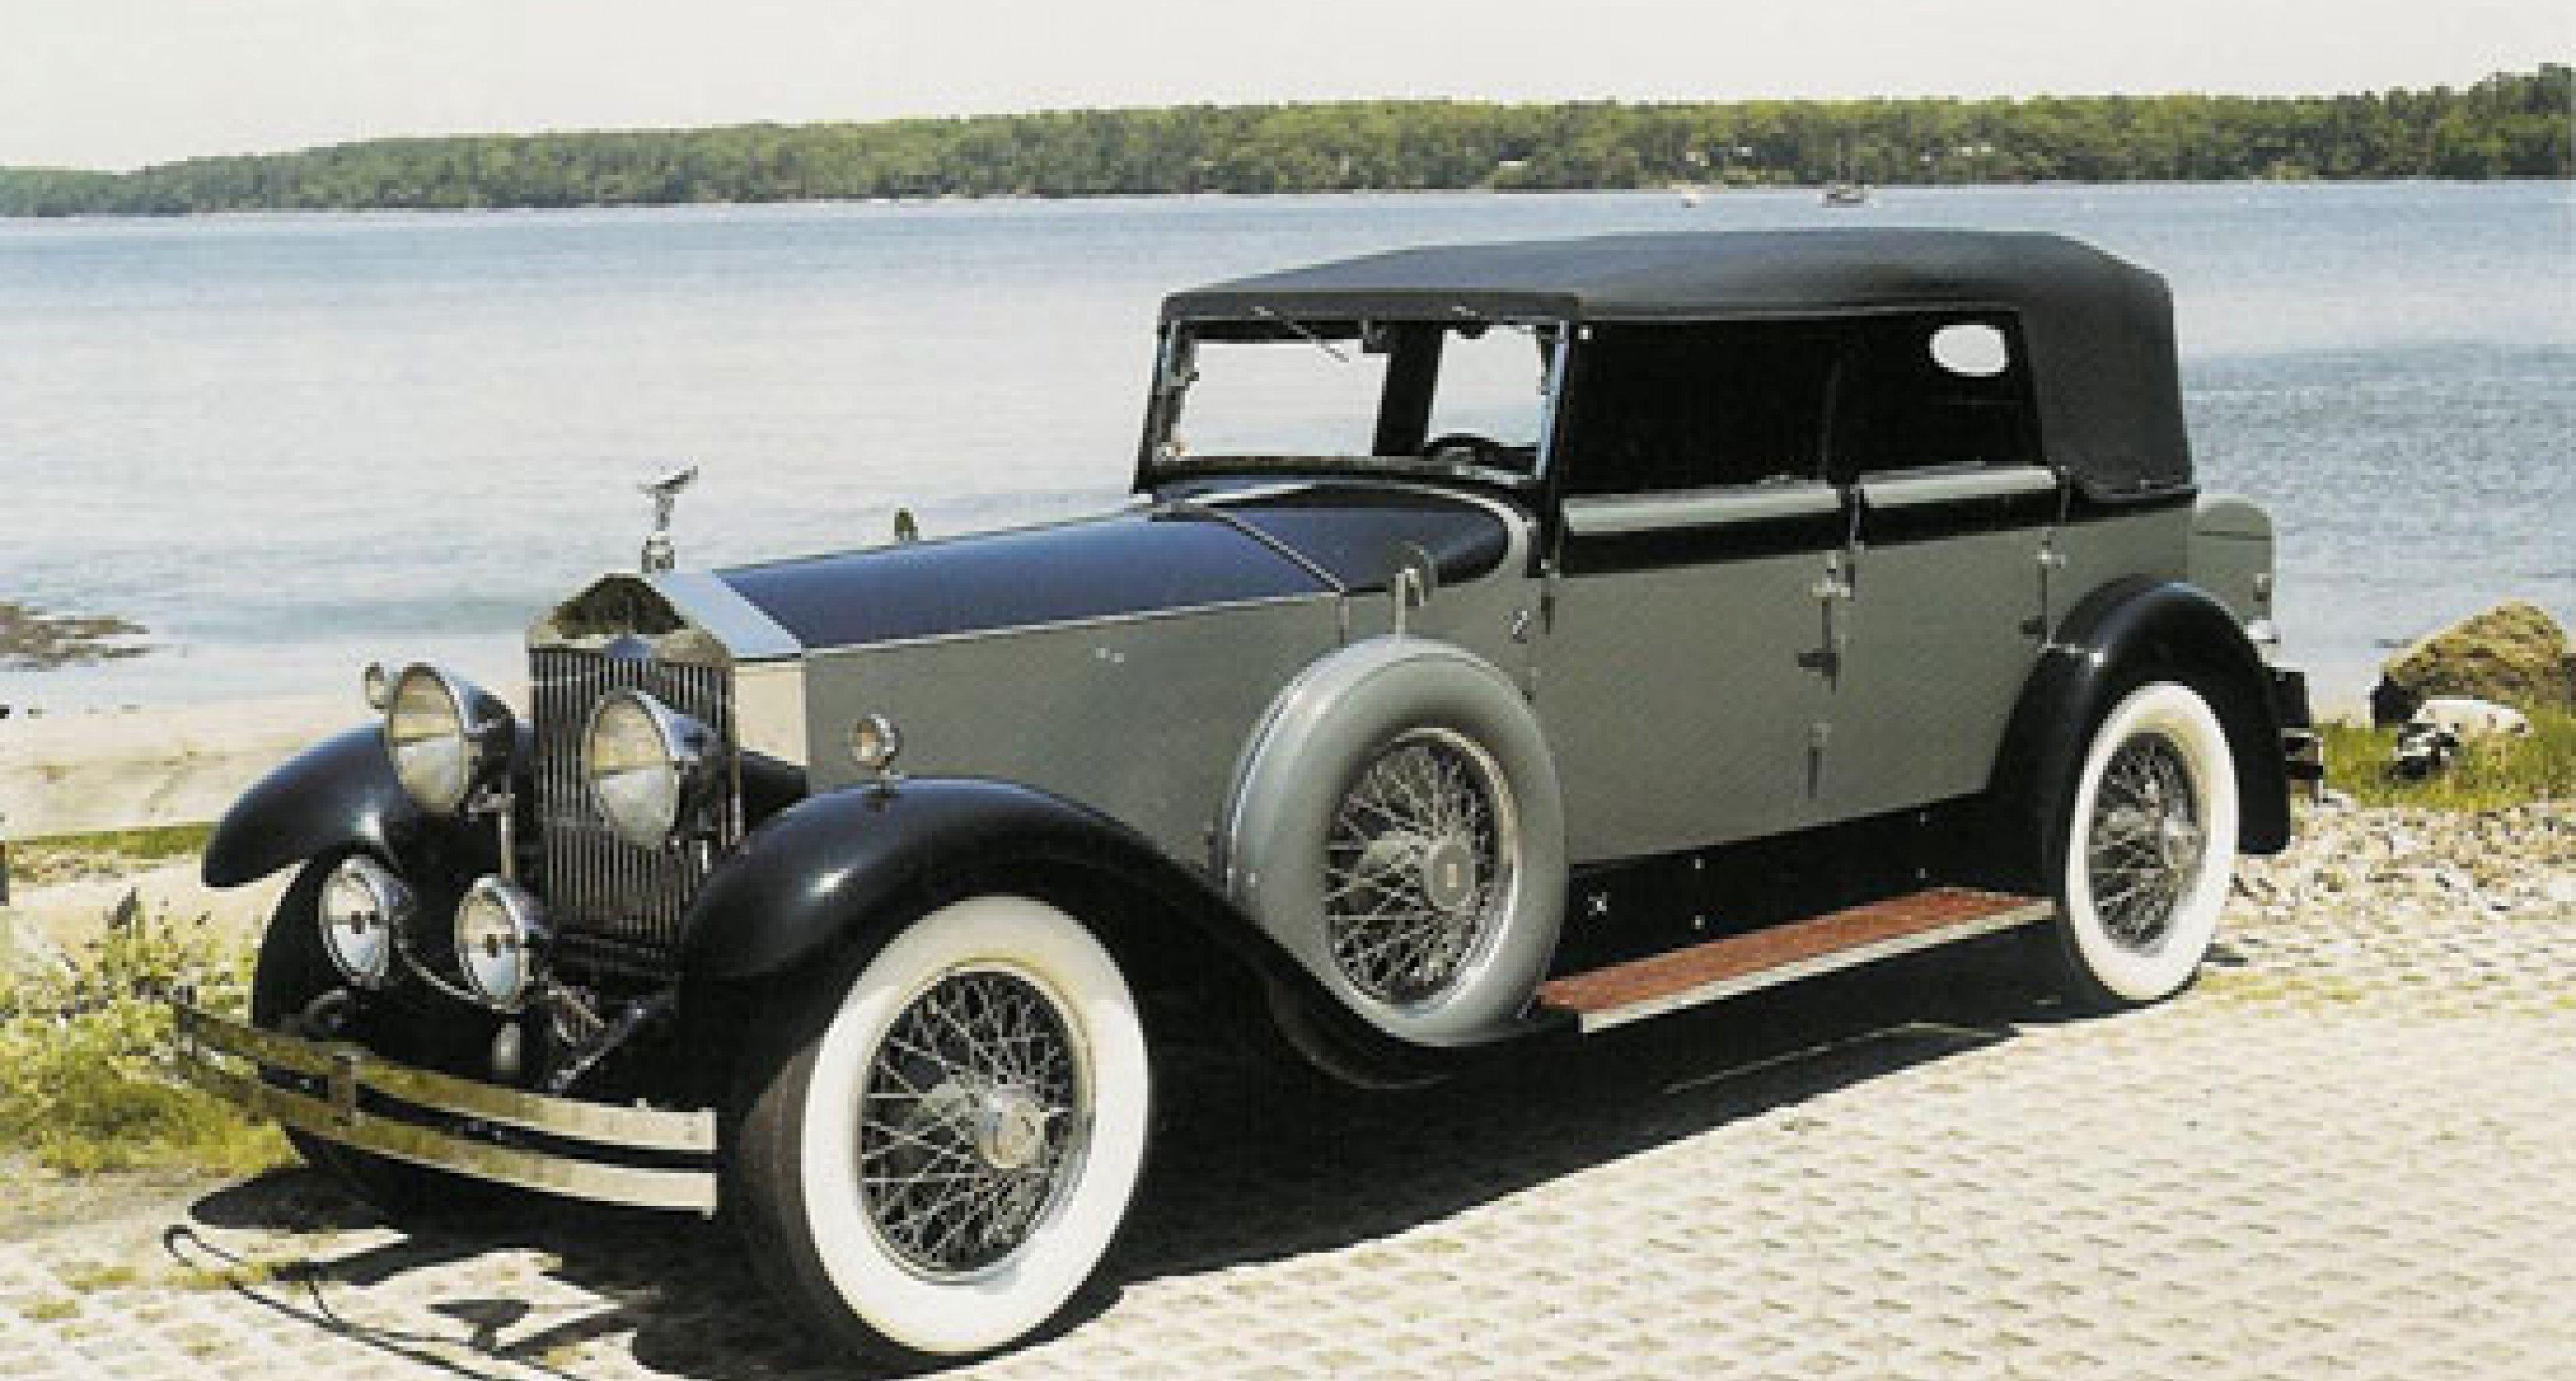 1st August 2003 Bonhams Sale of Rolls-Royce and Bentleys at Newport RI, USA